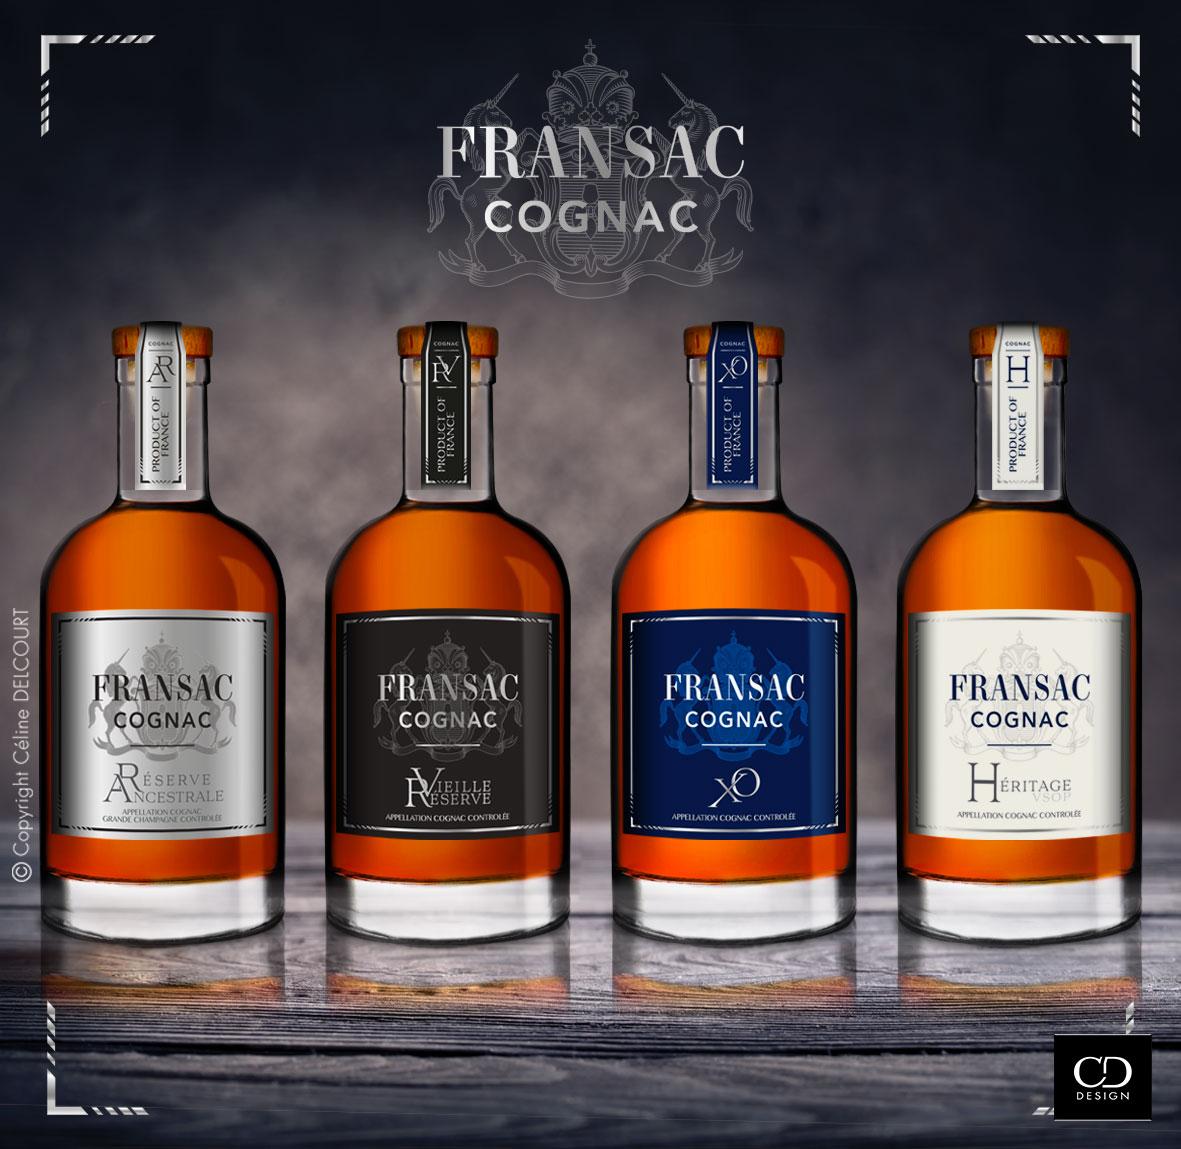 FRANSAC